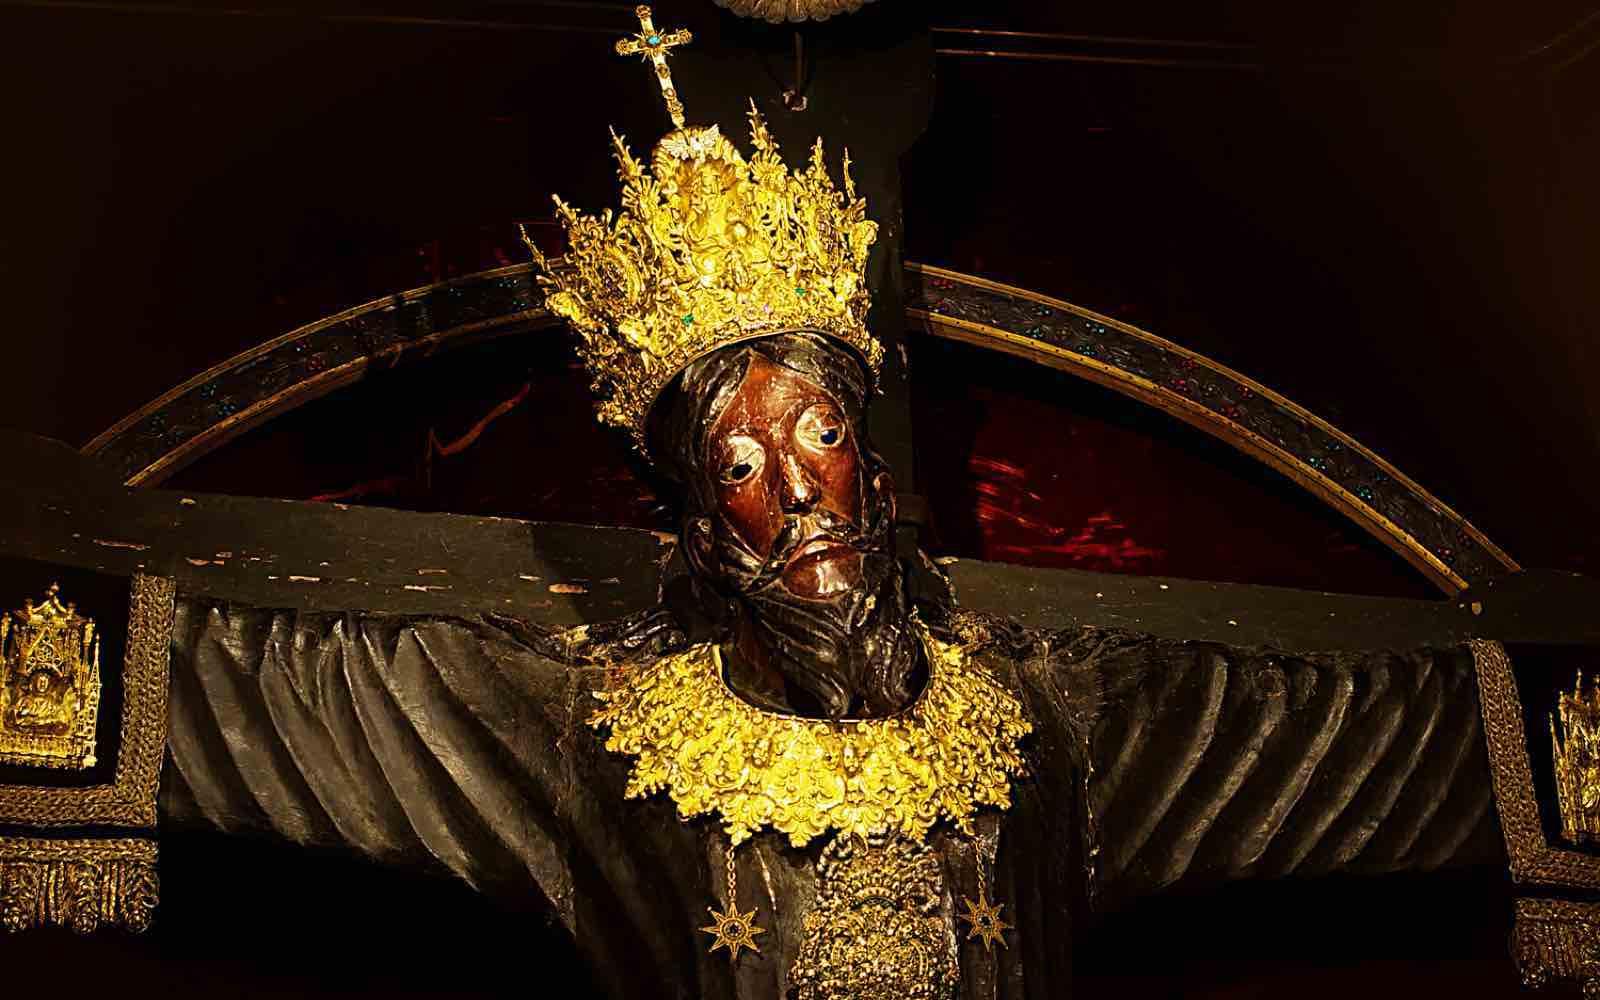 «Holy Face» i Lucca – Mirakuløs åpenbaring